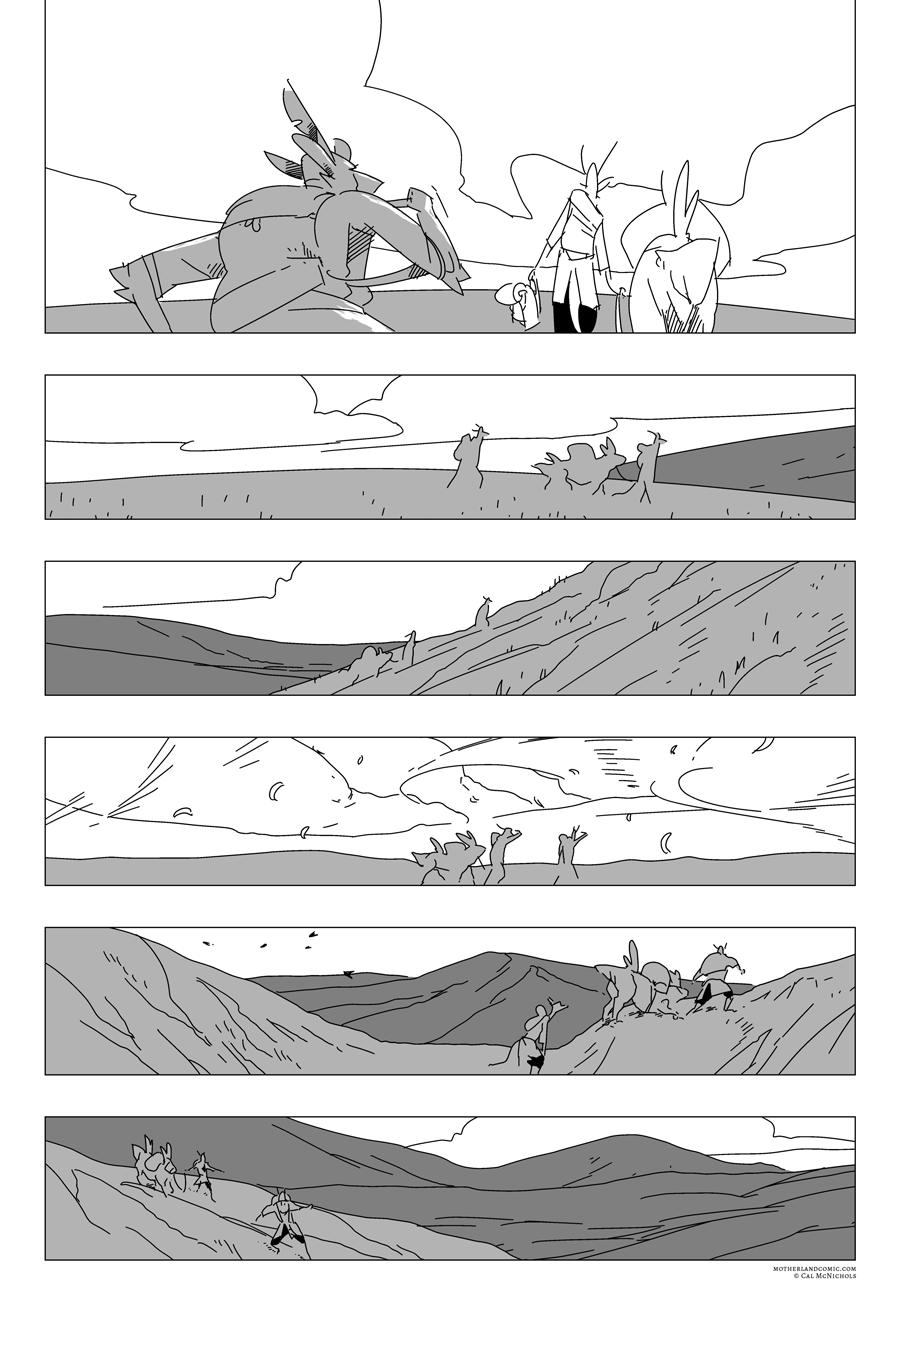 pg 92